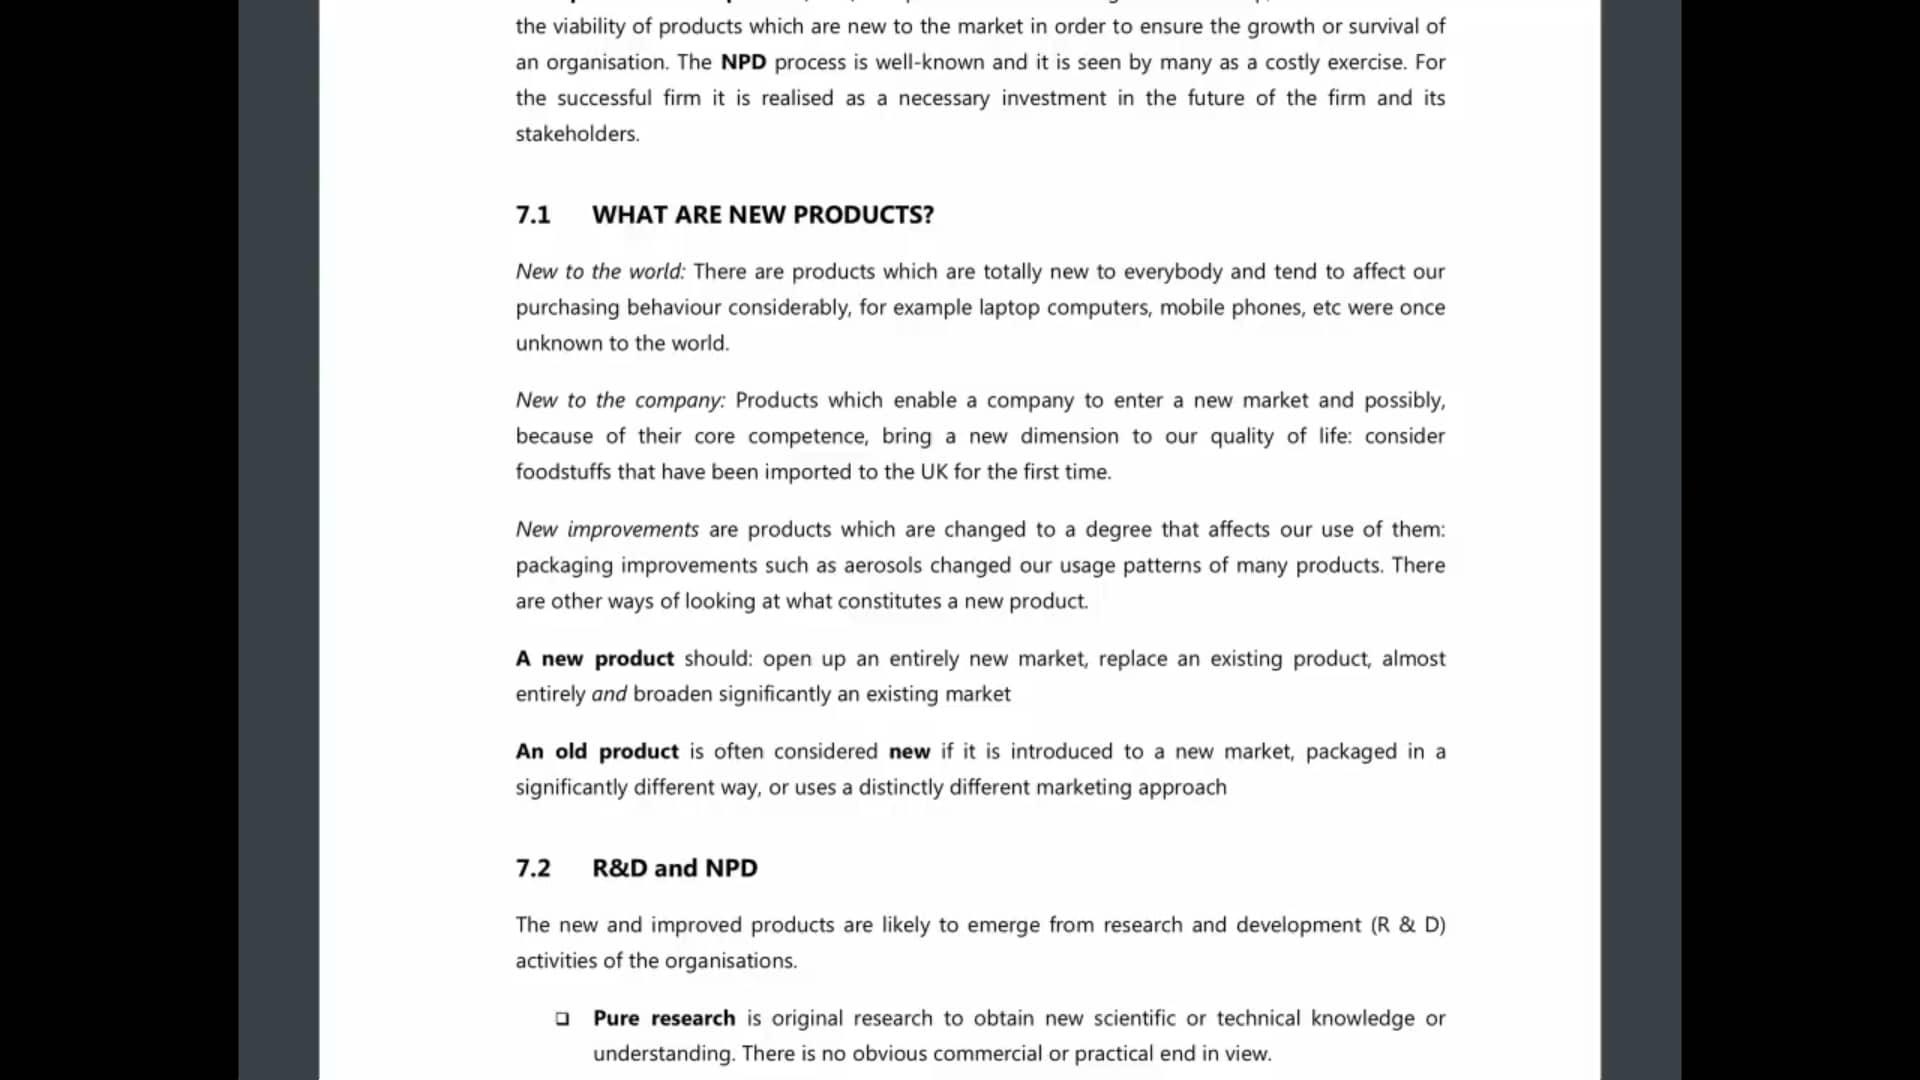 Ch 7 - New Product Development